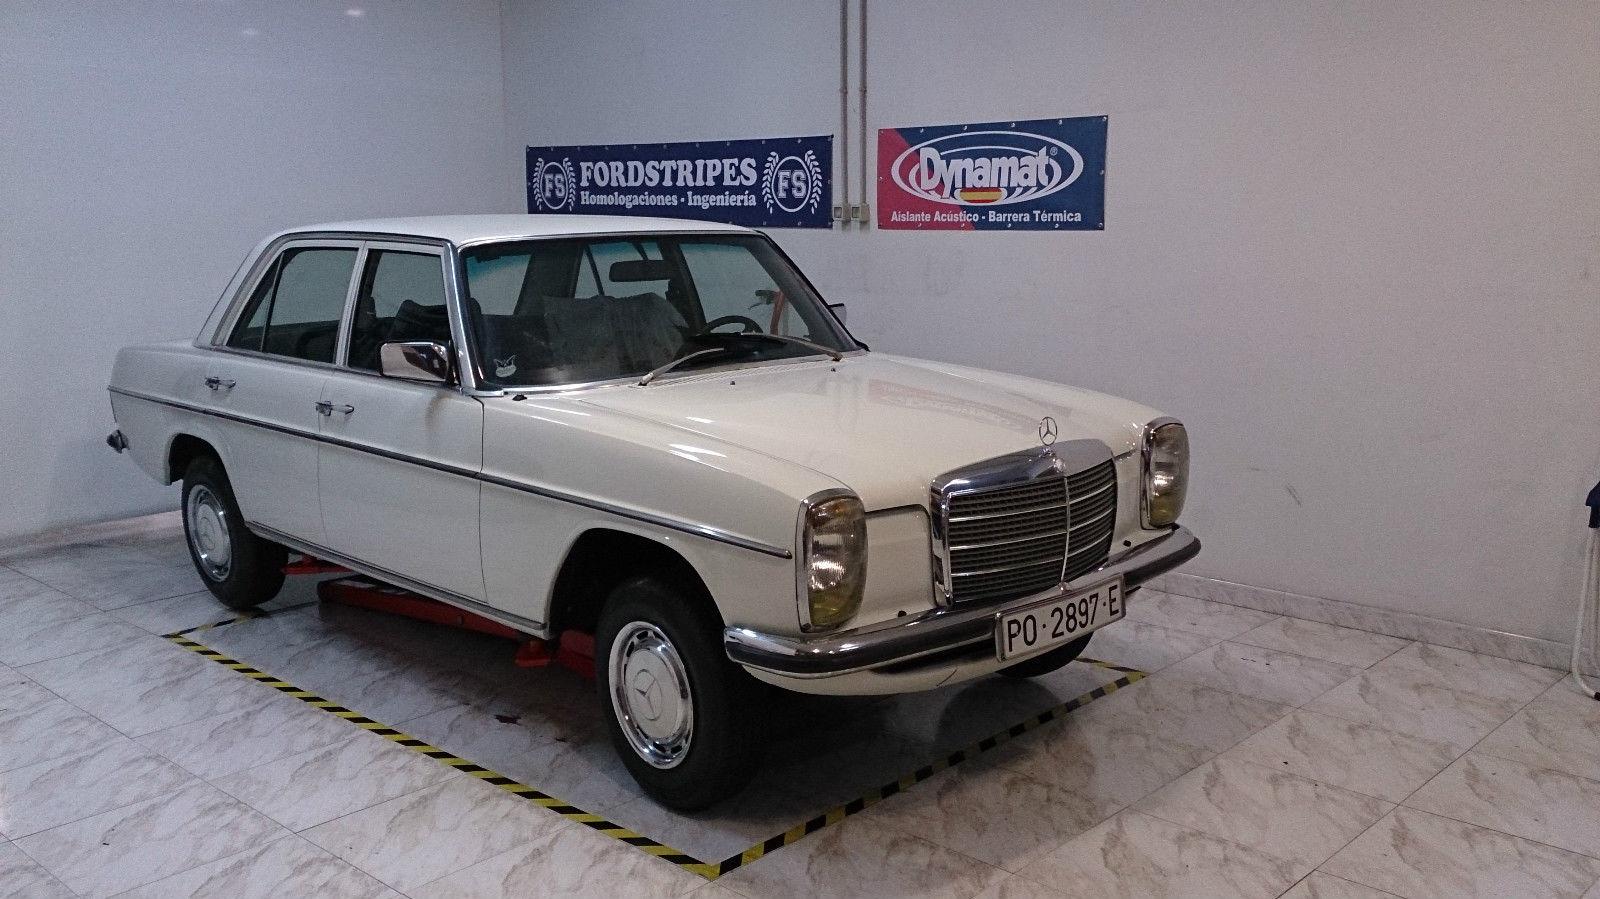 Mercedes Benz W114 230 6 1975 For Sale In Oviedo Spain